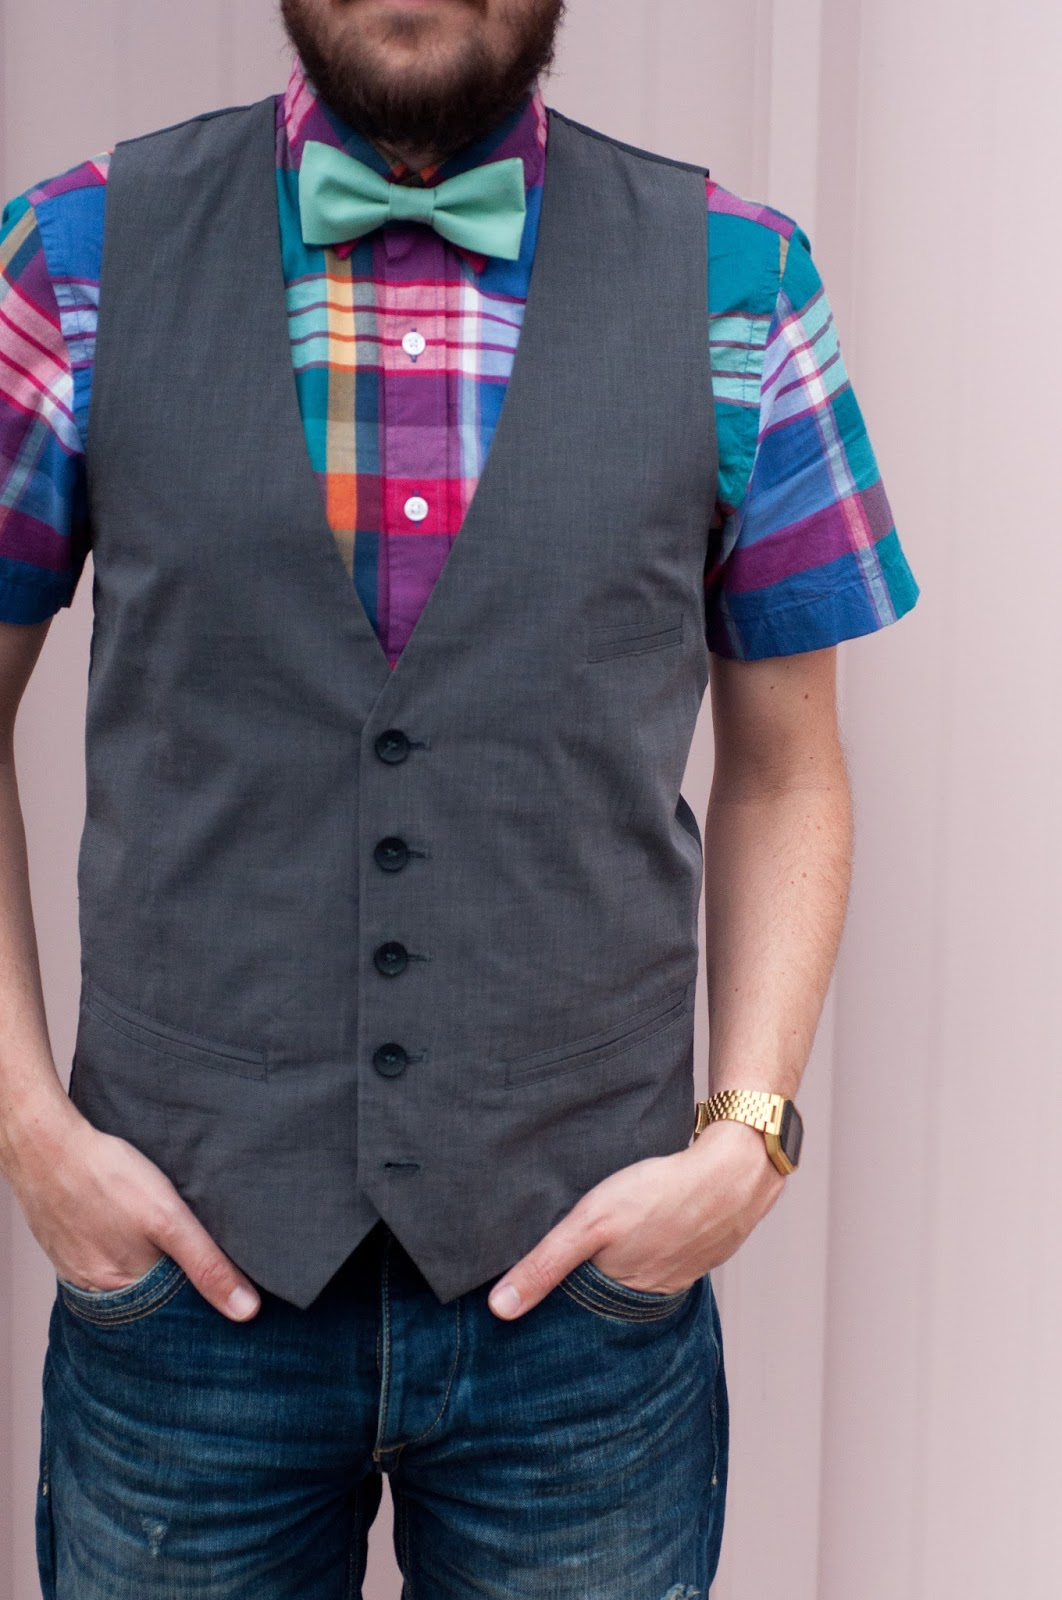 kelsey bang bow tie, mens fashion, mens style, mens ootd, zara, jcrew, plaid